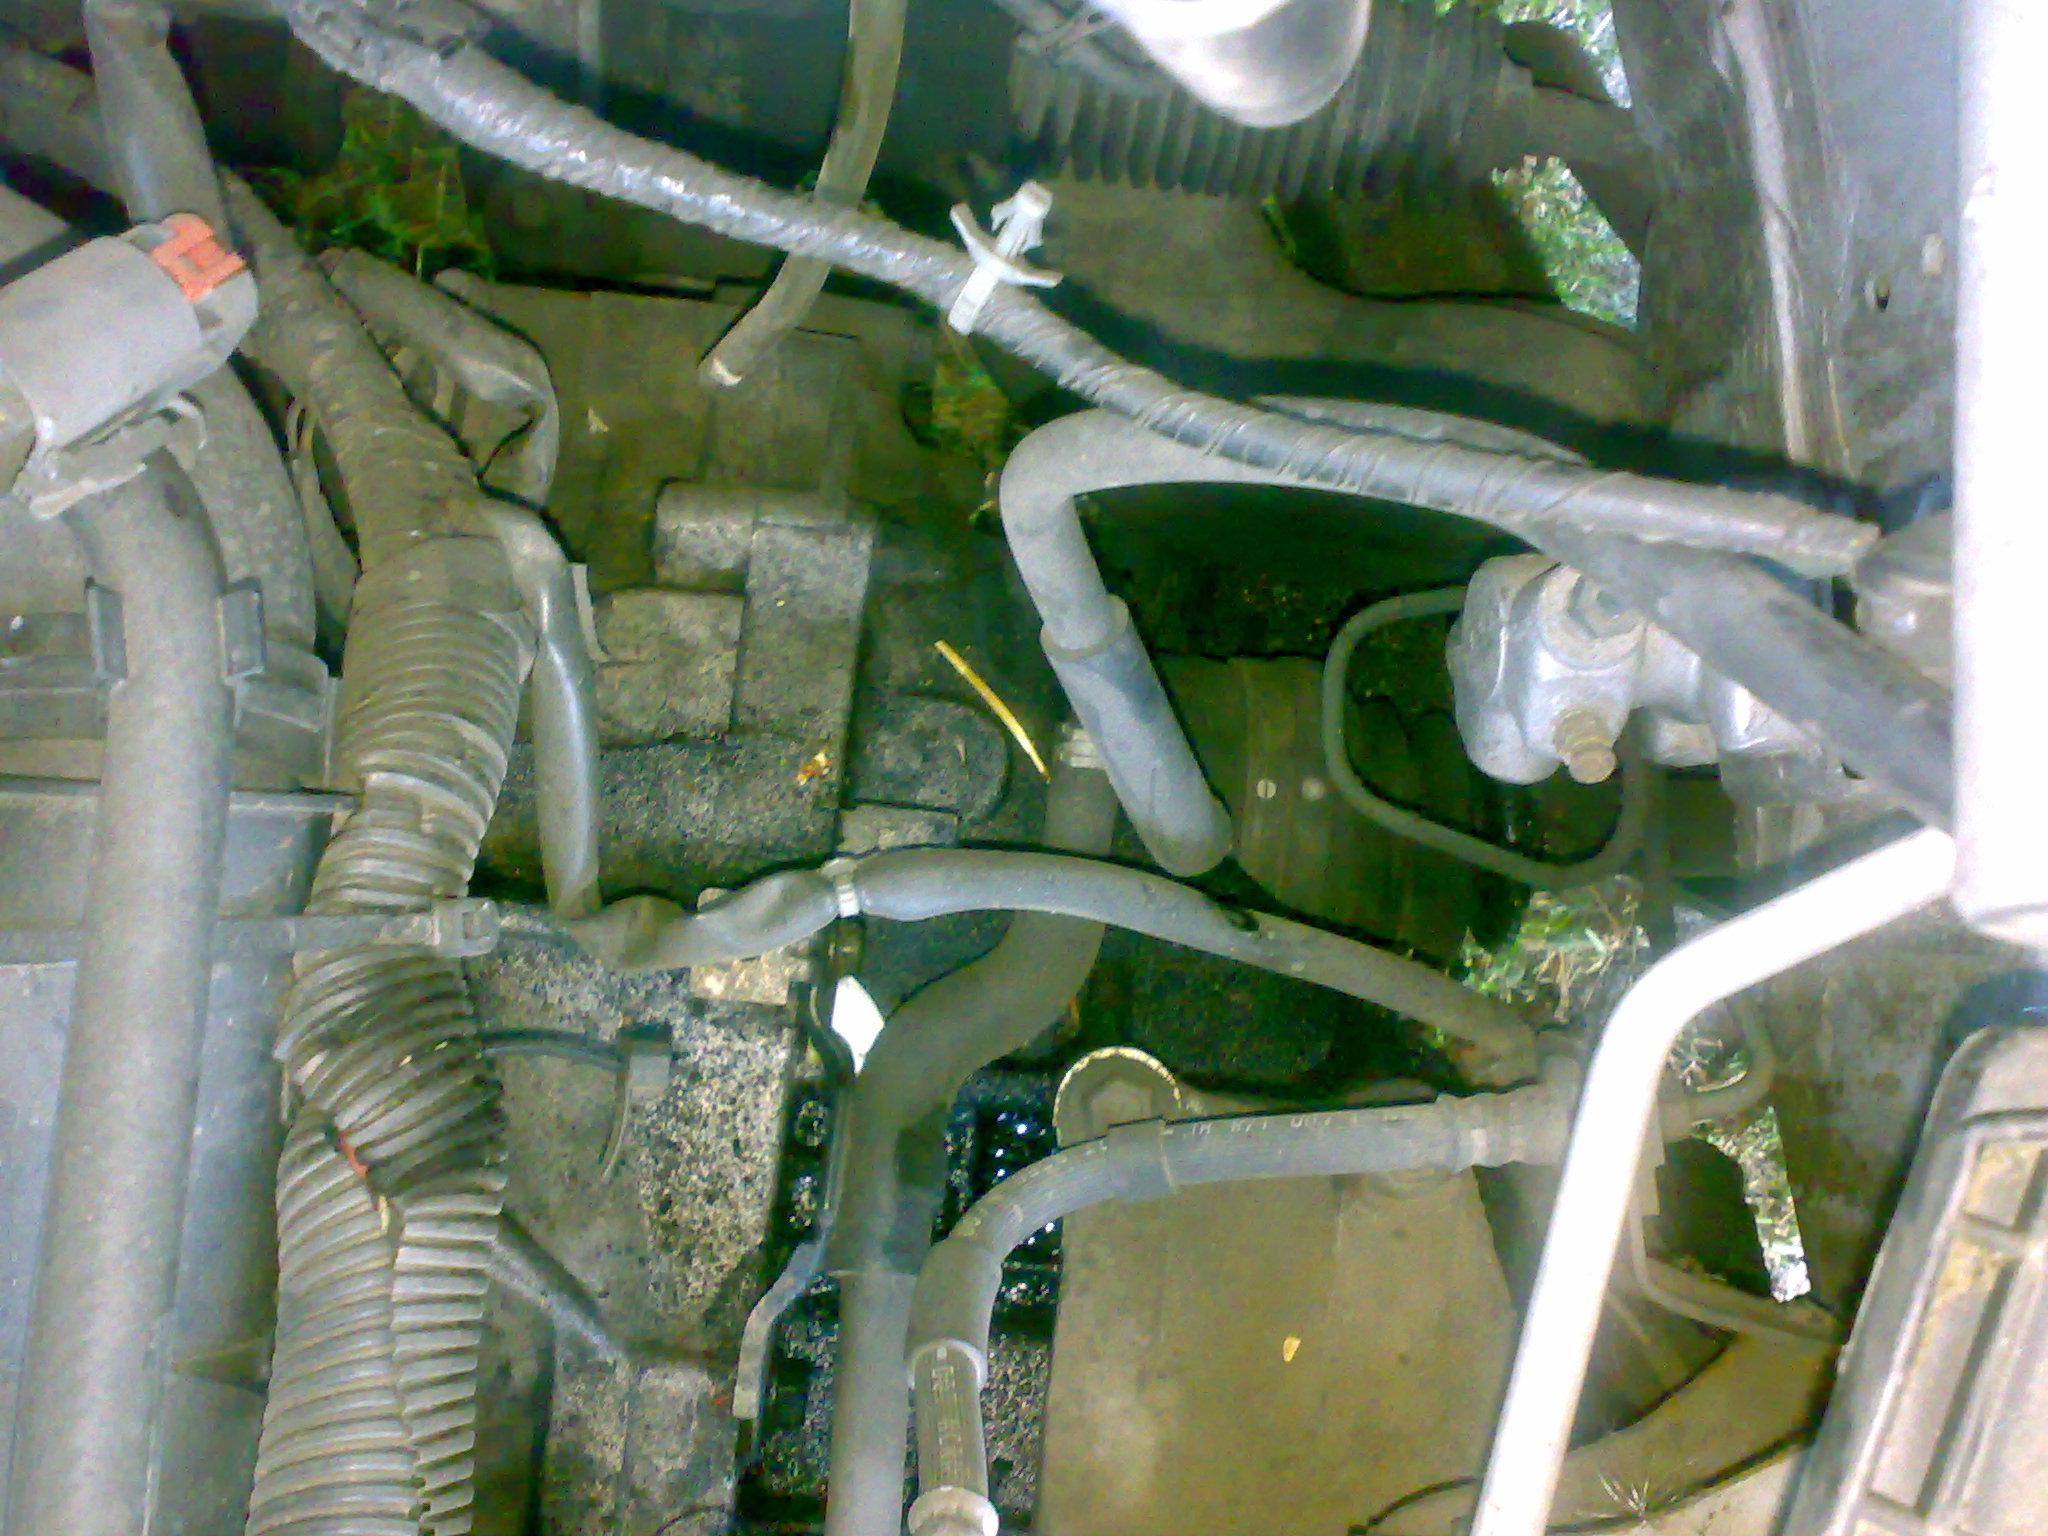 Nissan Primera 2.0TD 2000rok spad� Przew�d z silnika